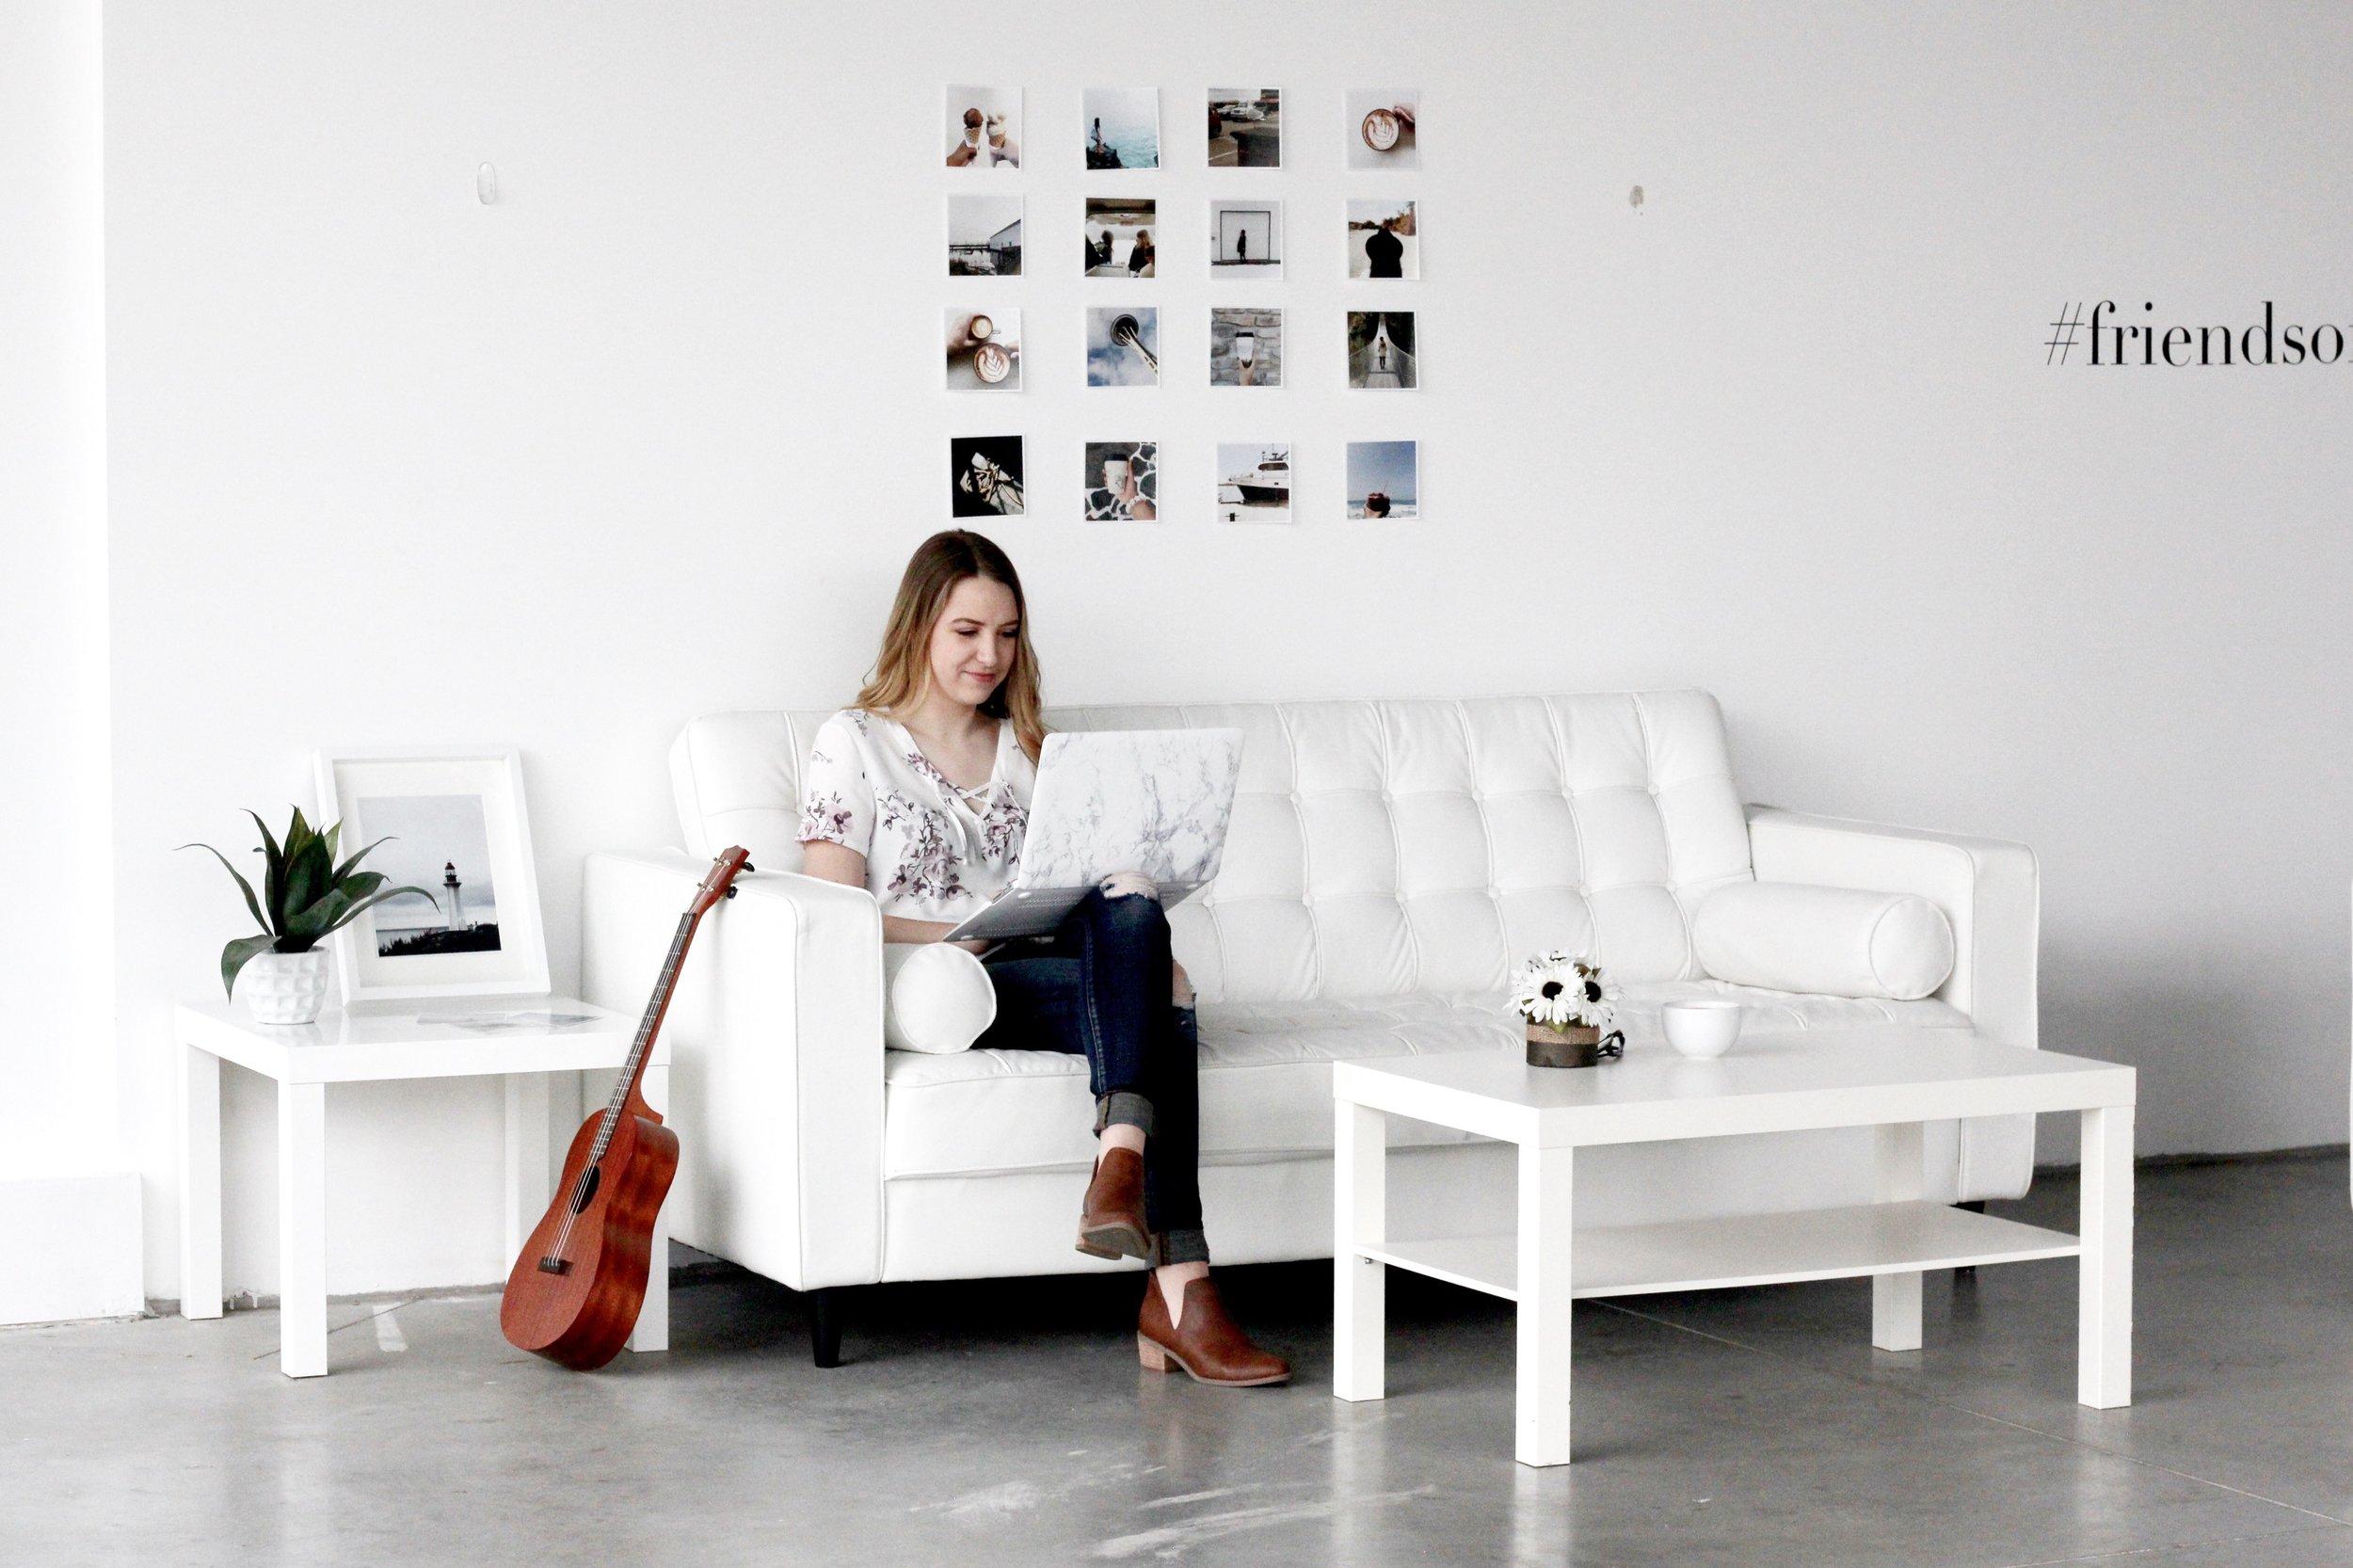 MODEL: ASHLEIGH BALL  (check out her work at @ashleighballcalligraphy)  WHITE MARBLE LAPTOP CASE: Renpho